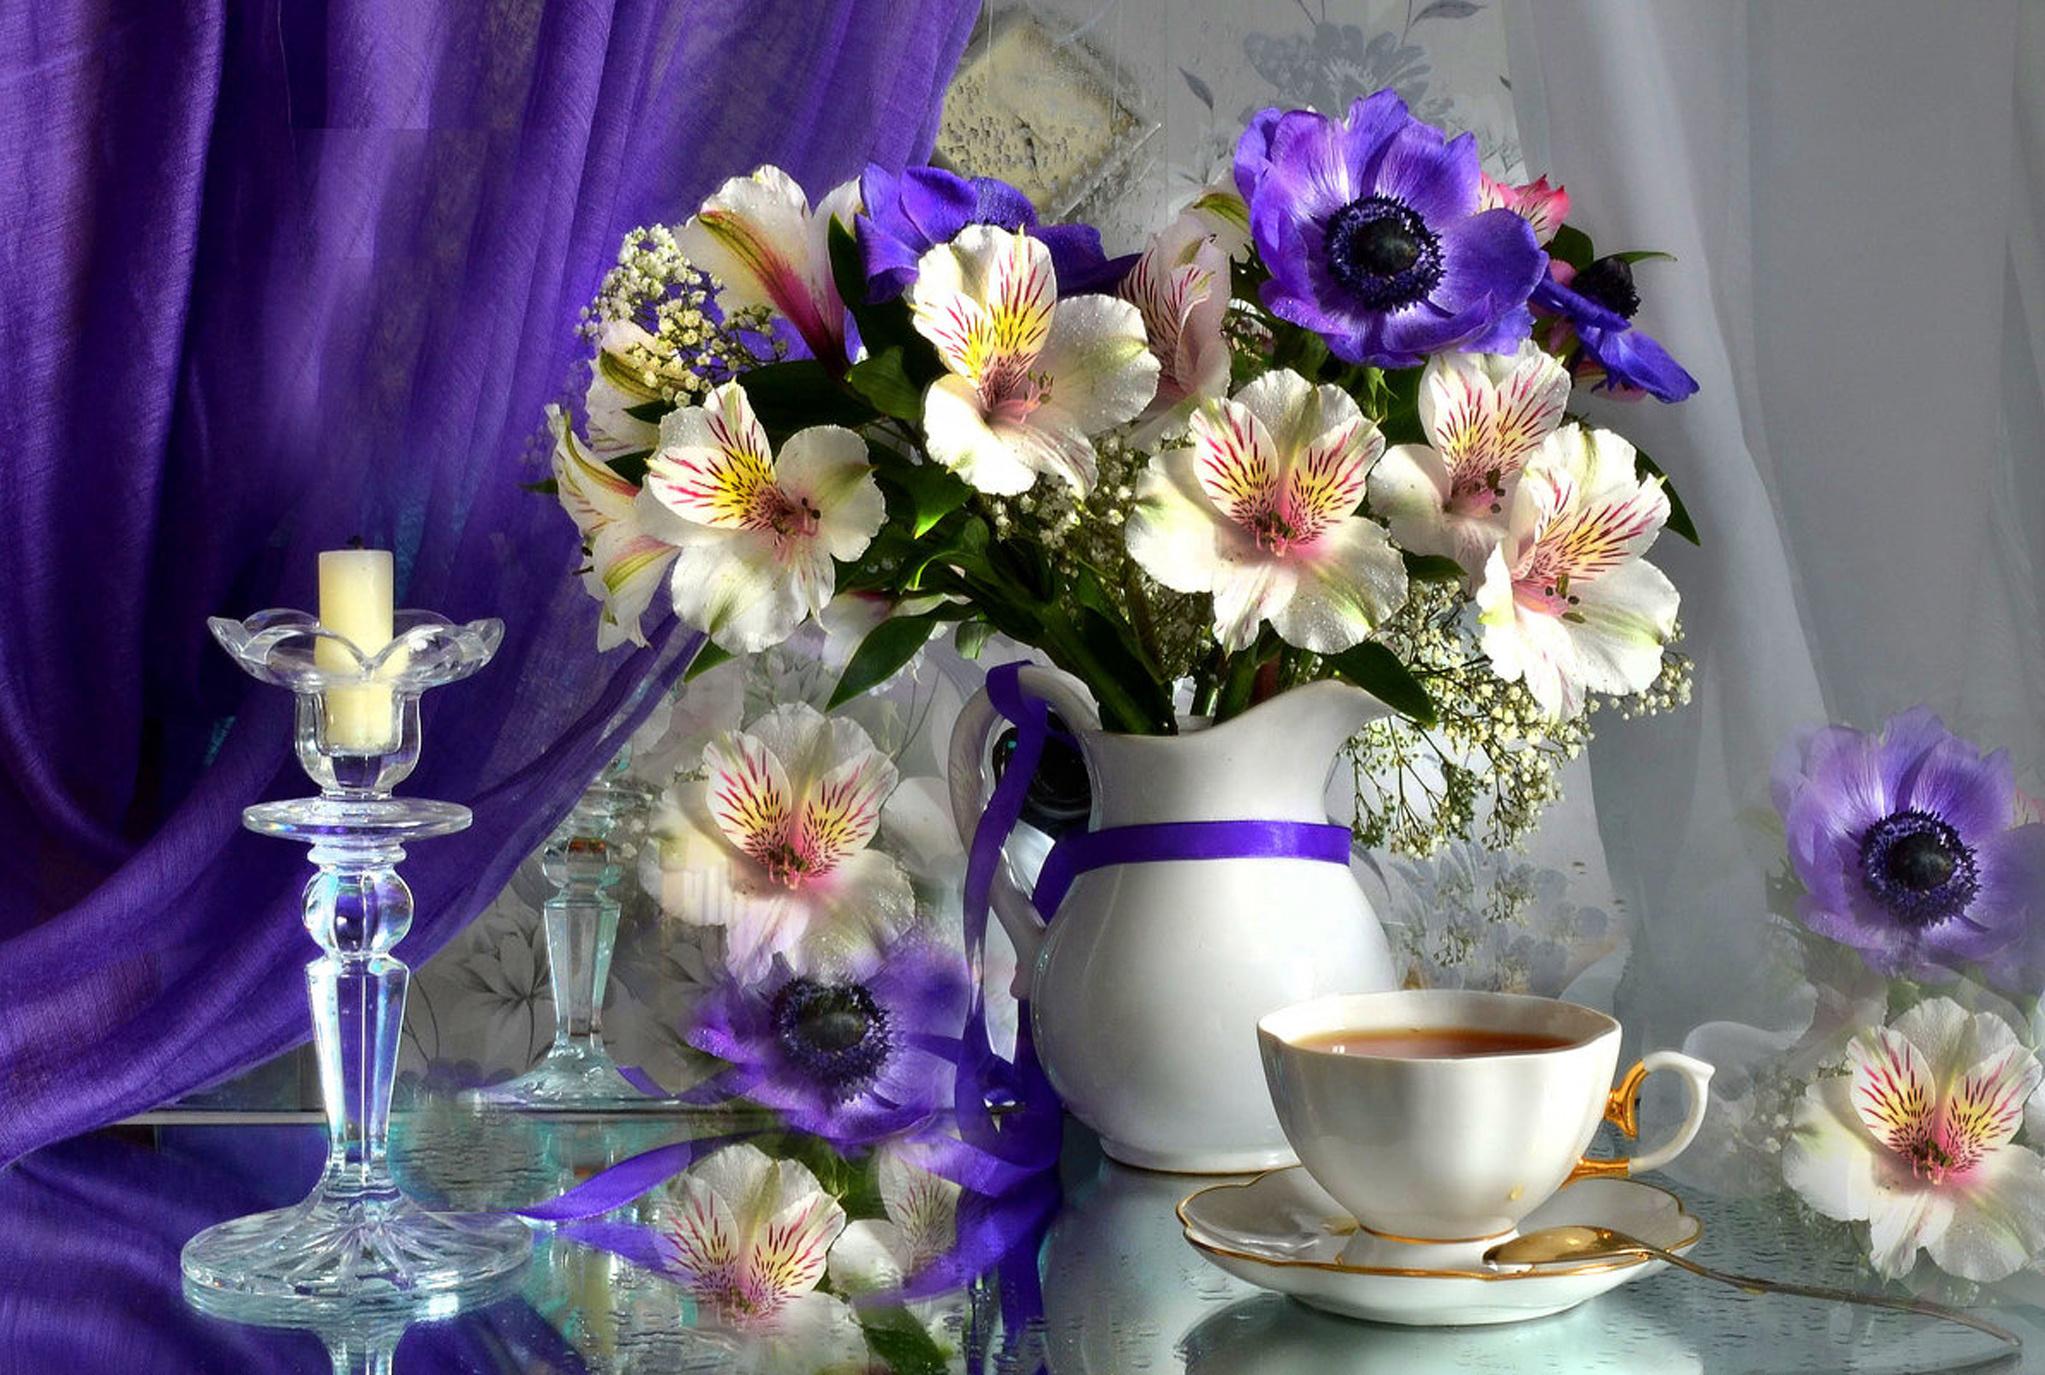 Приятного вечера картинка с цветами, картинки февраля